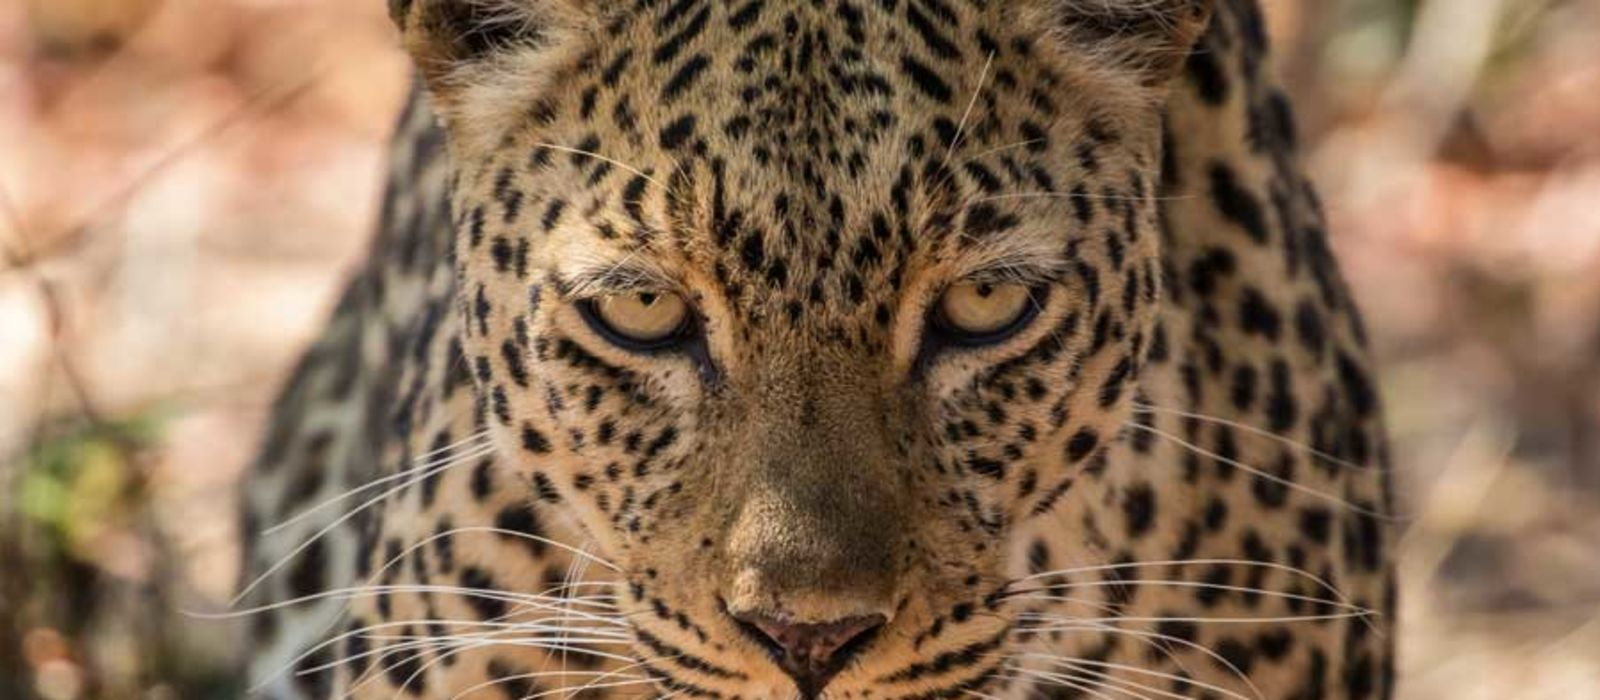 Malawi, Sambia und Mosambik: Safari, Malawisee und Strand Urlaub 2